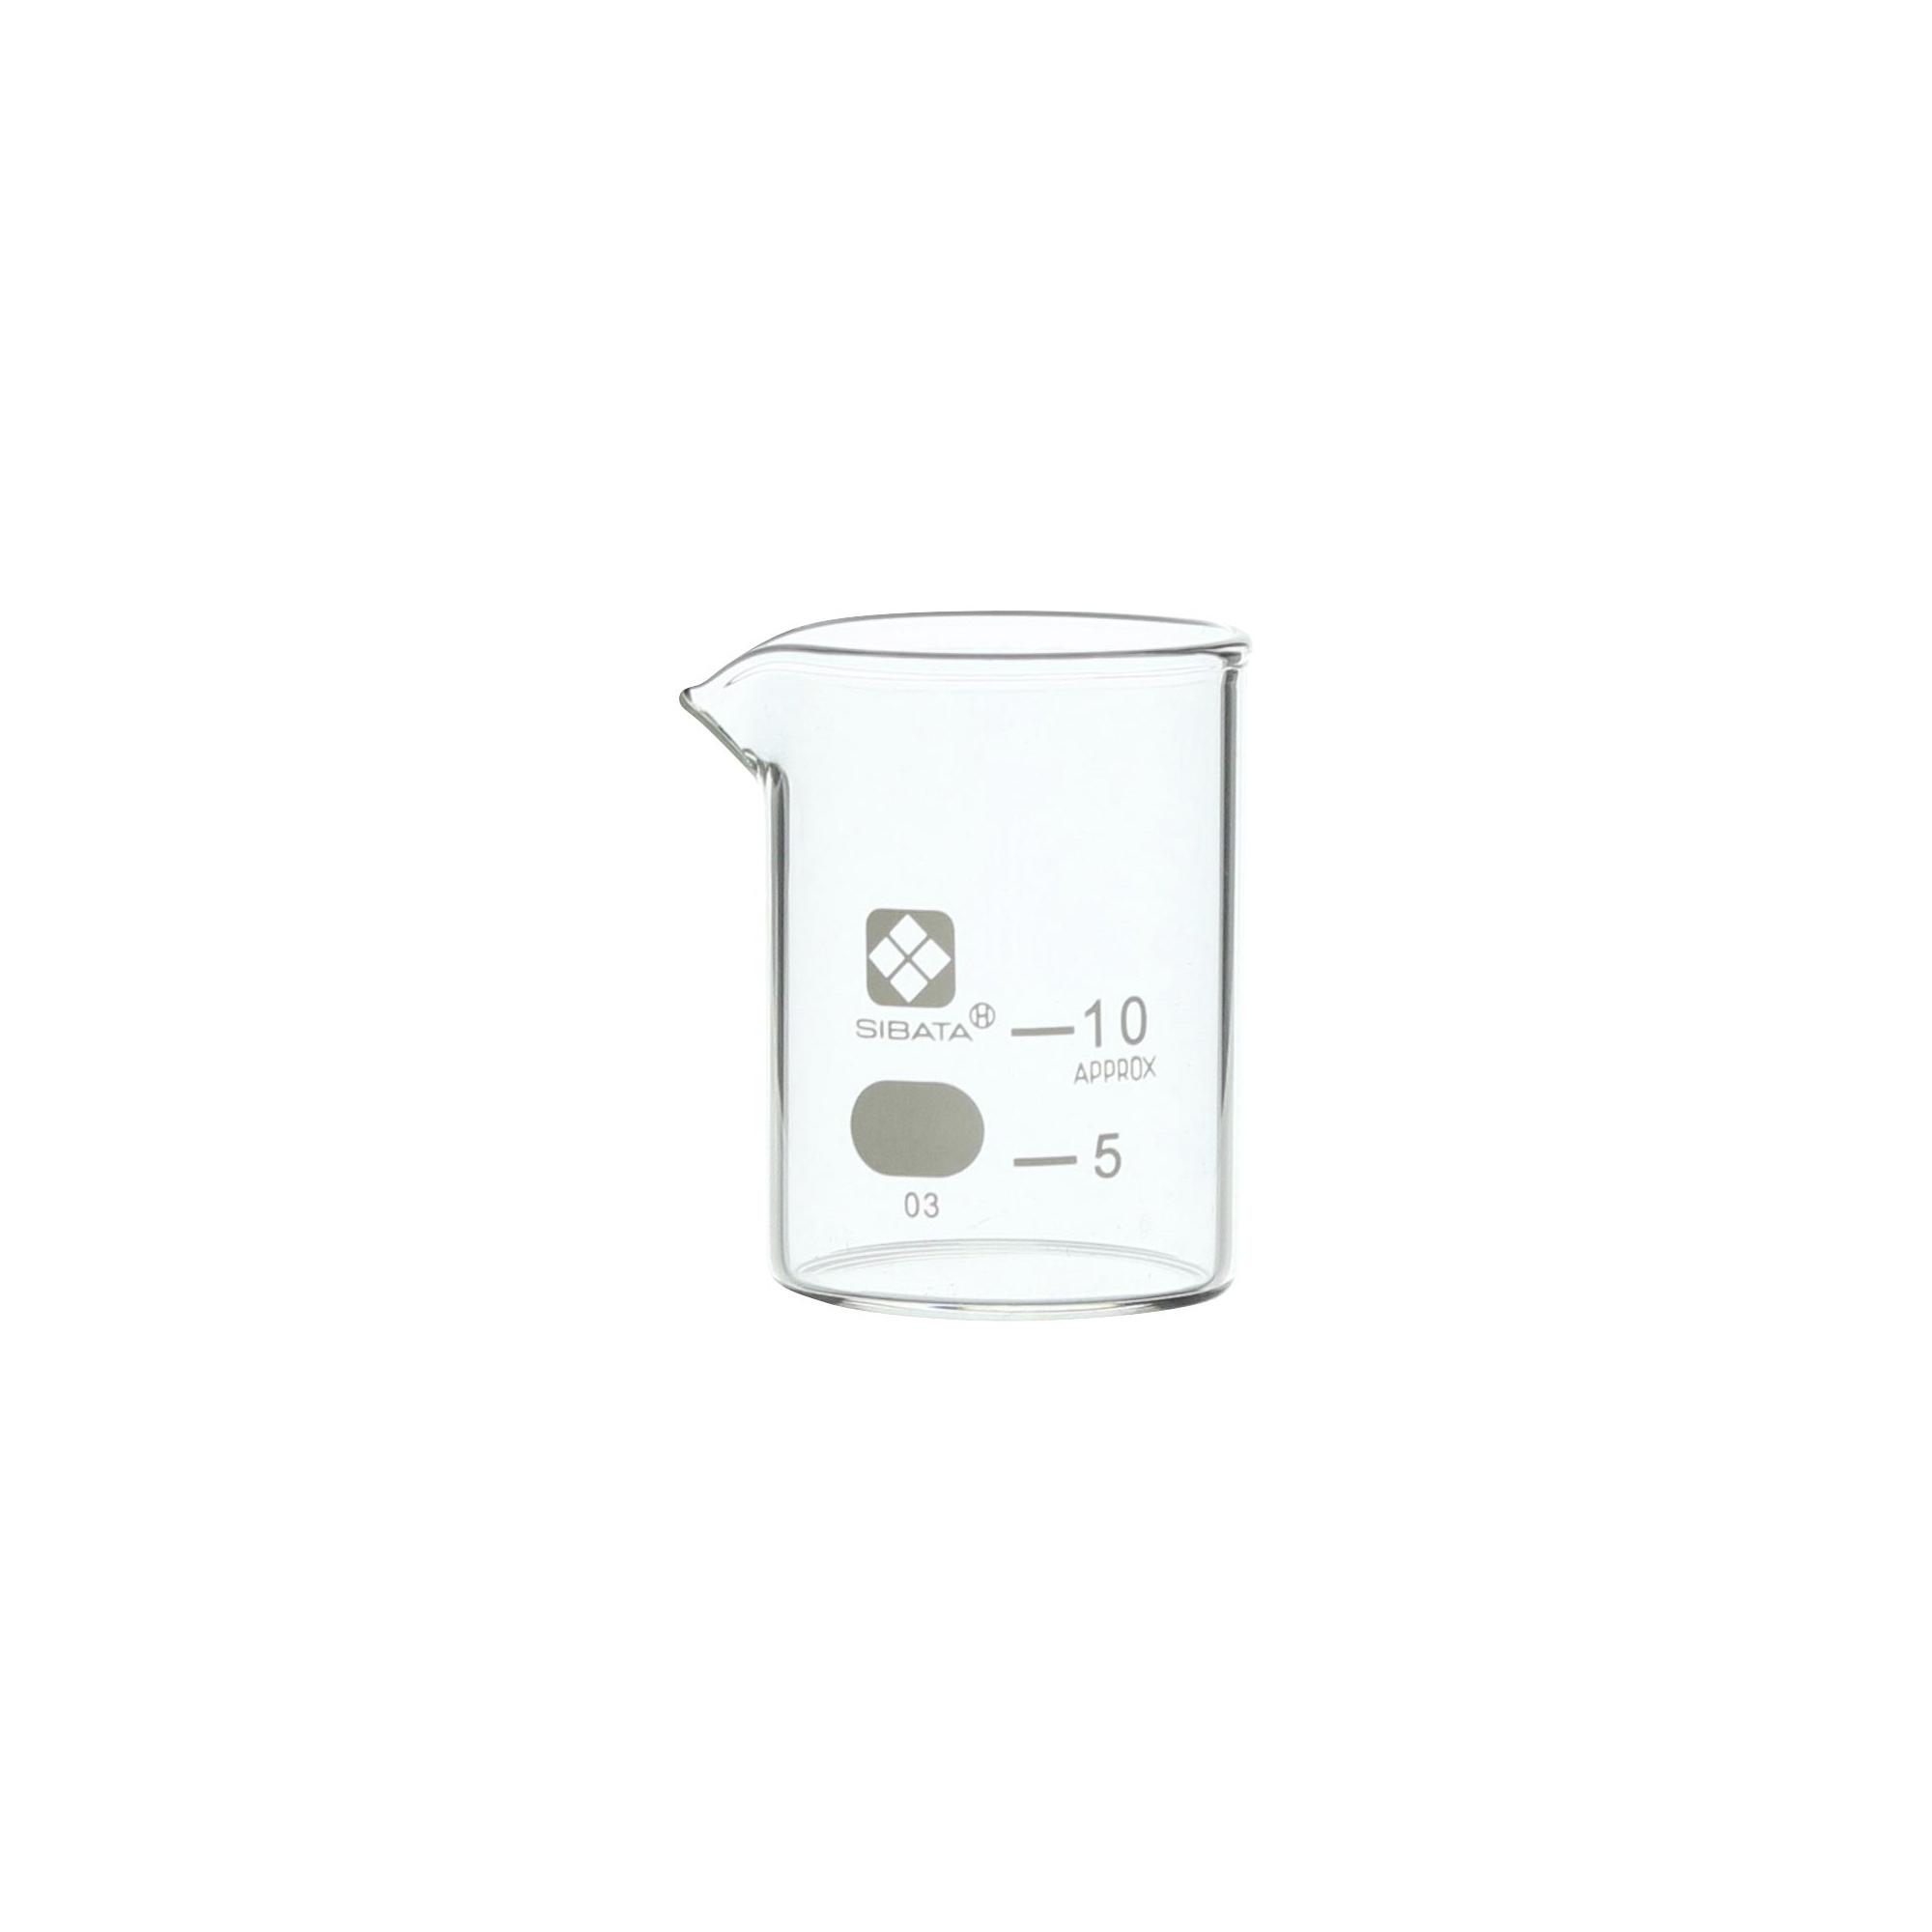 010020-10A SIBATA ビーカー 目安目盛付 10mL(6個) 柴田科学(SIBATA)